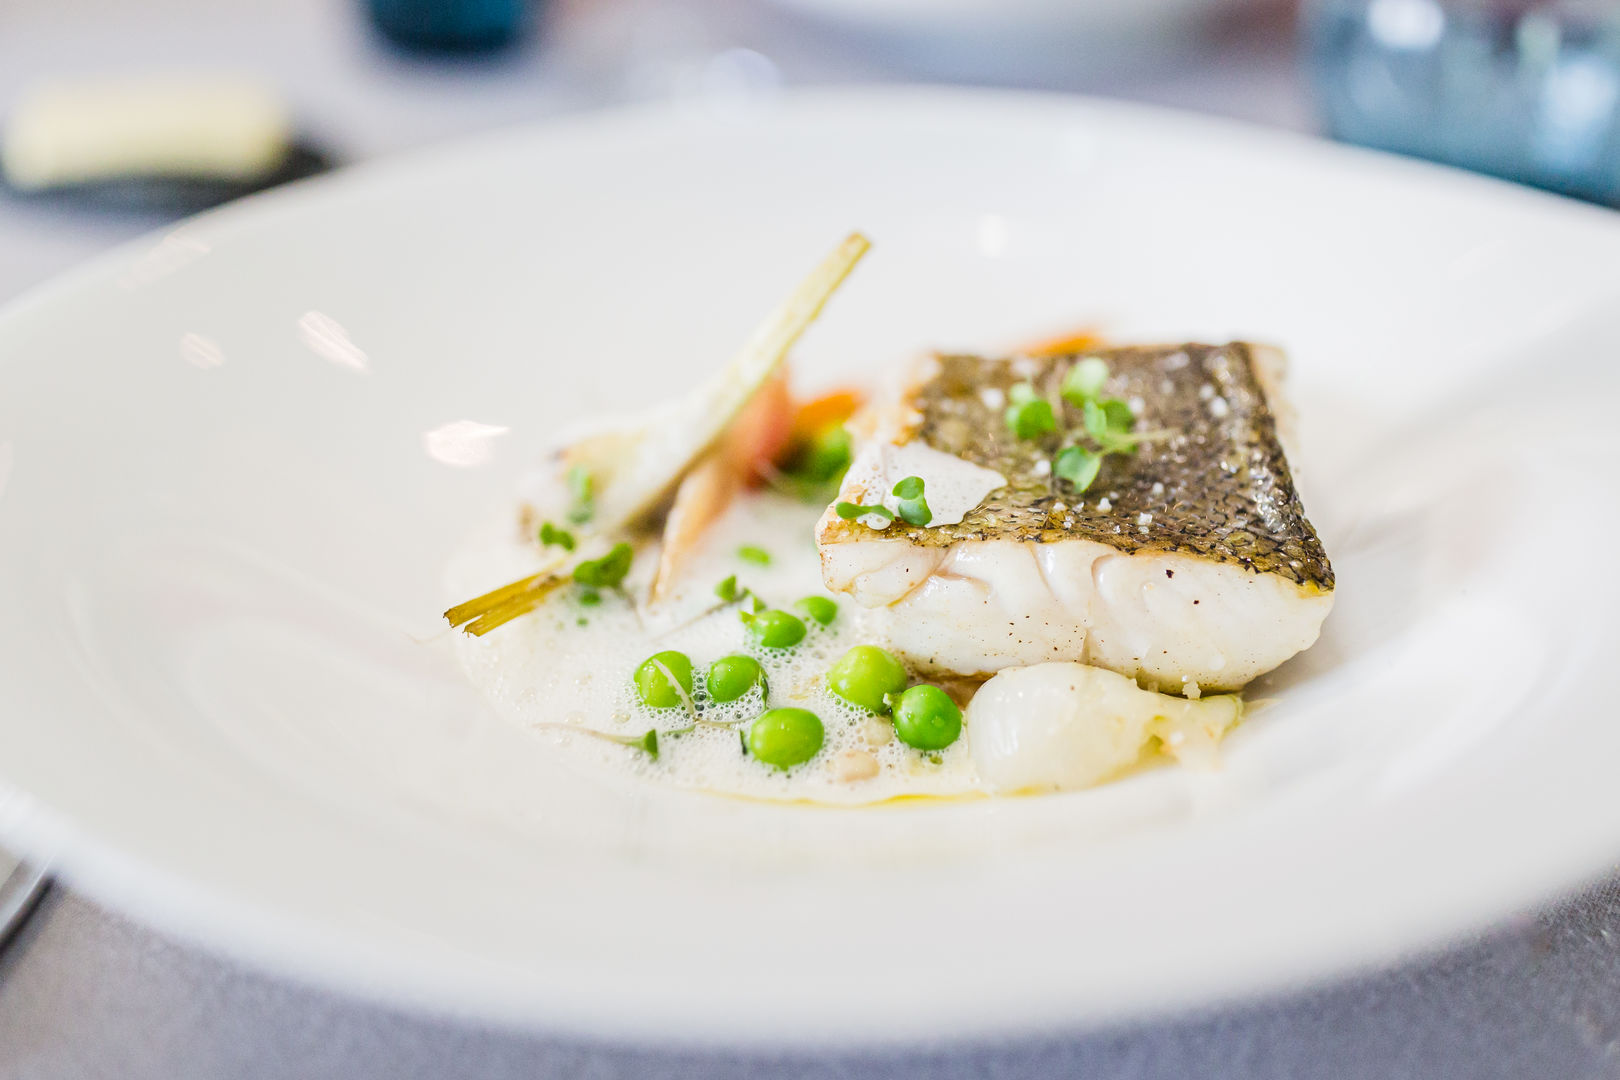 Hotel-Aigue-marine-2019---Restaurant-Plat-Cabillaud-2